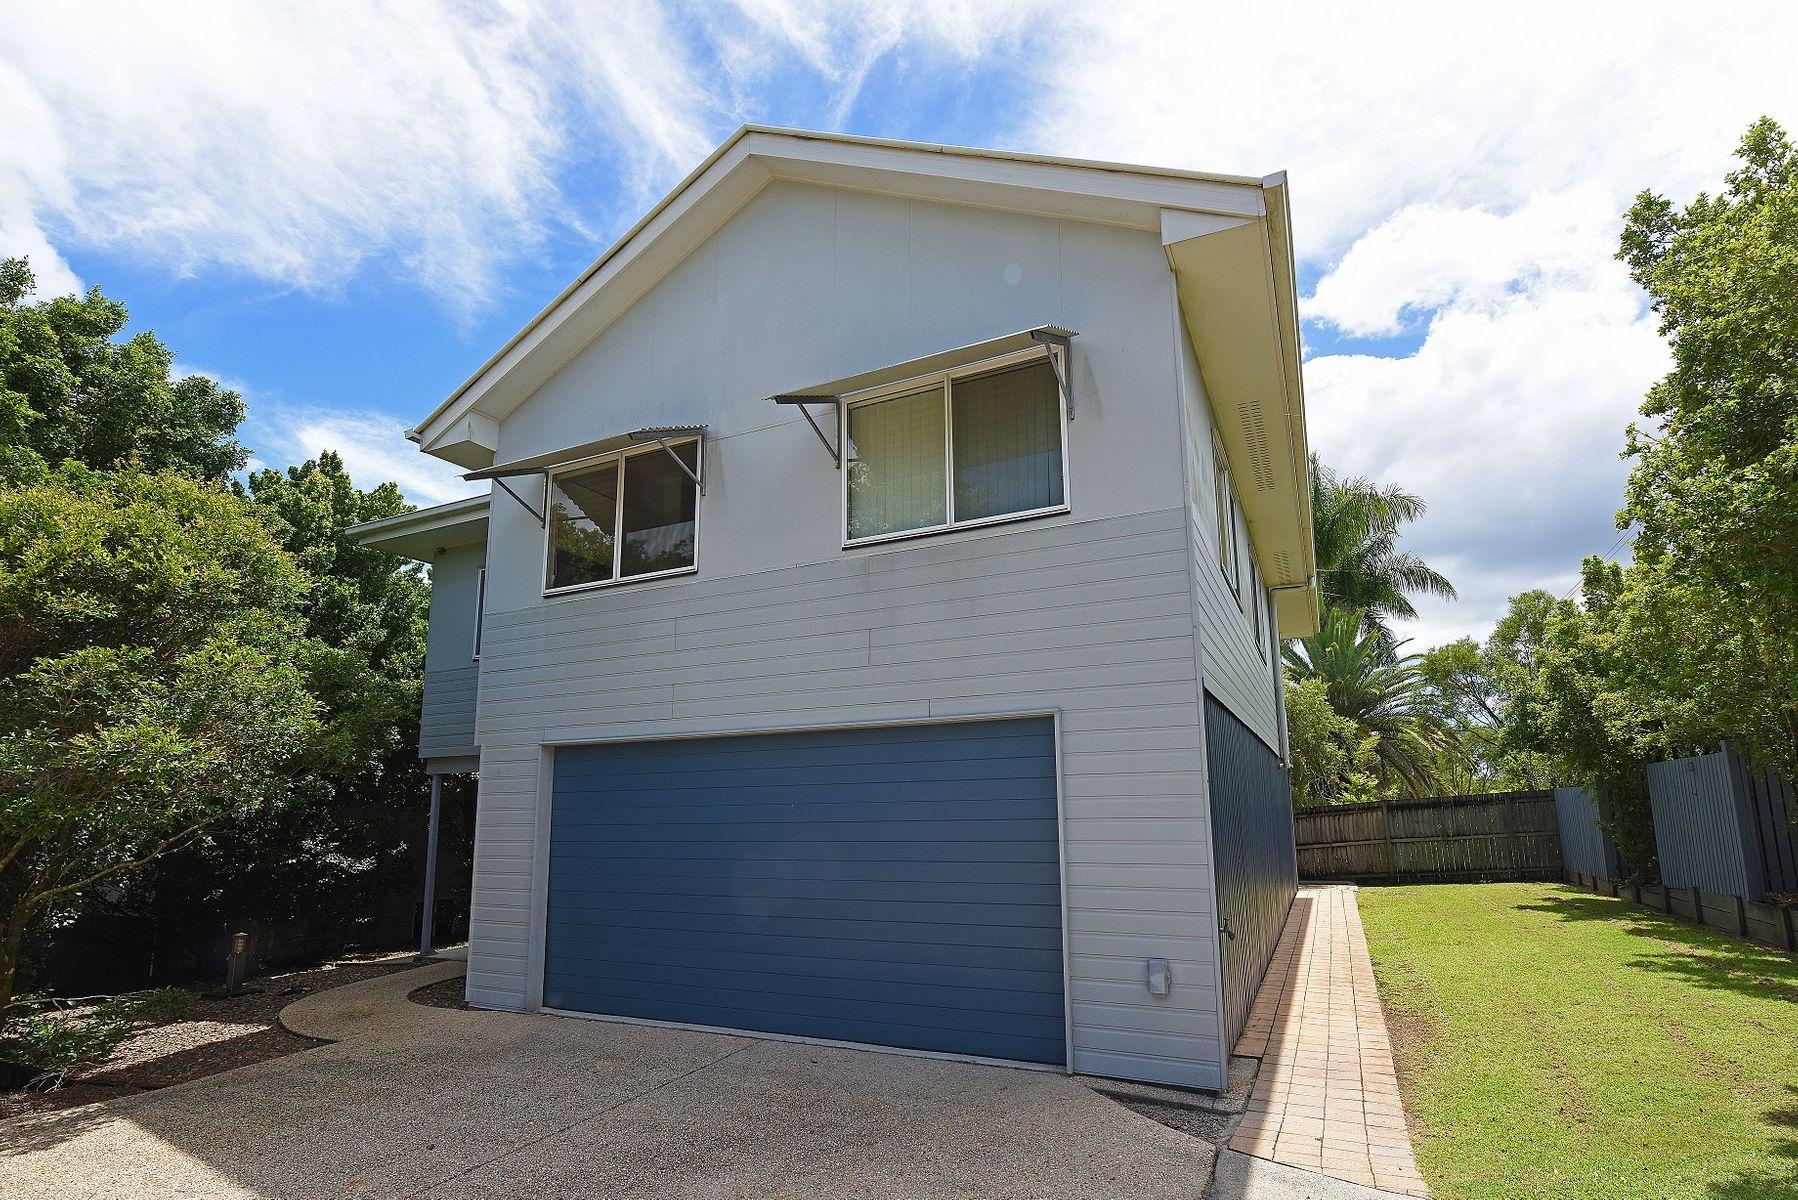 3/38 Netherton Street, Nambour, QLD 4560